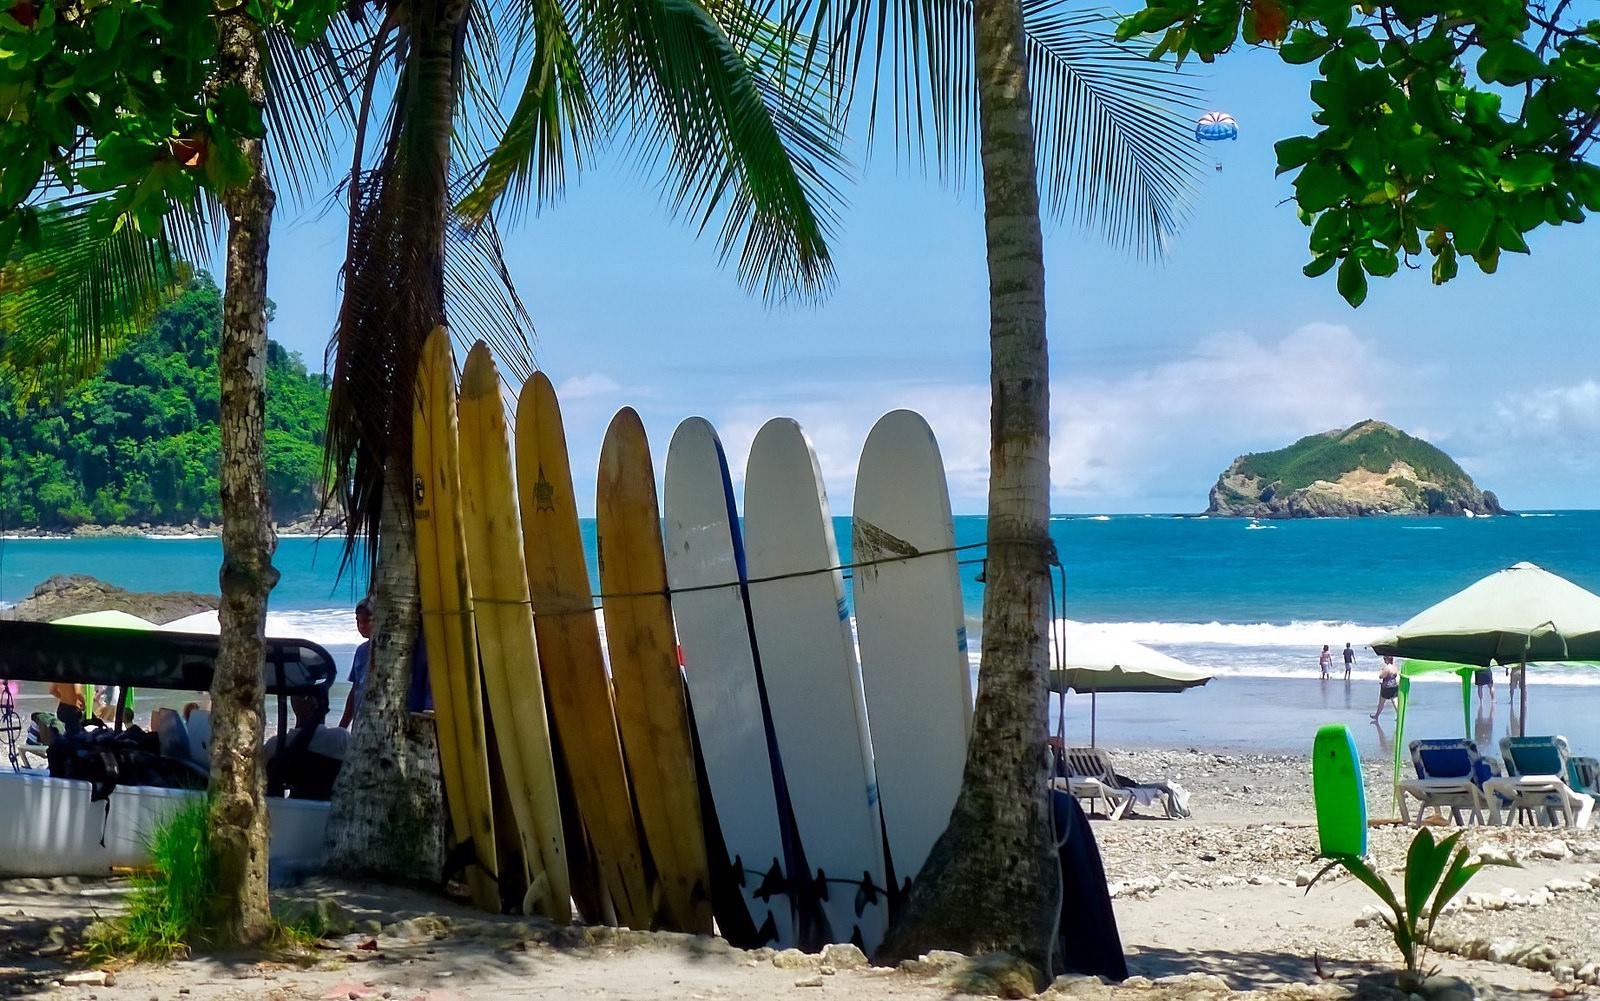 Playa Maracas, Quepos | © F Delventhal / Flickr